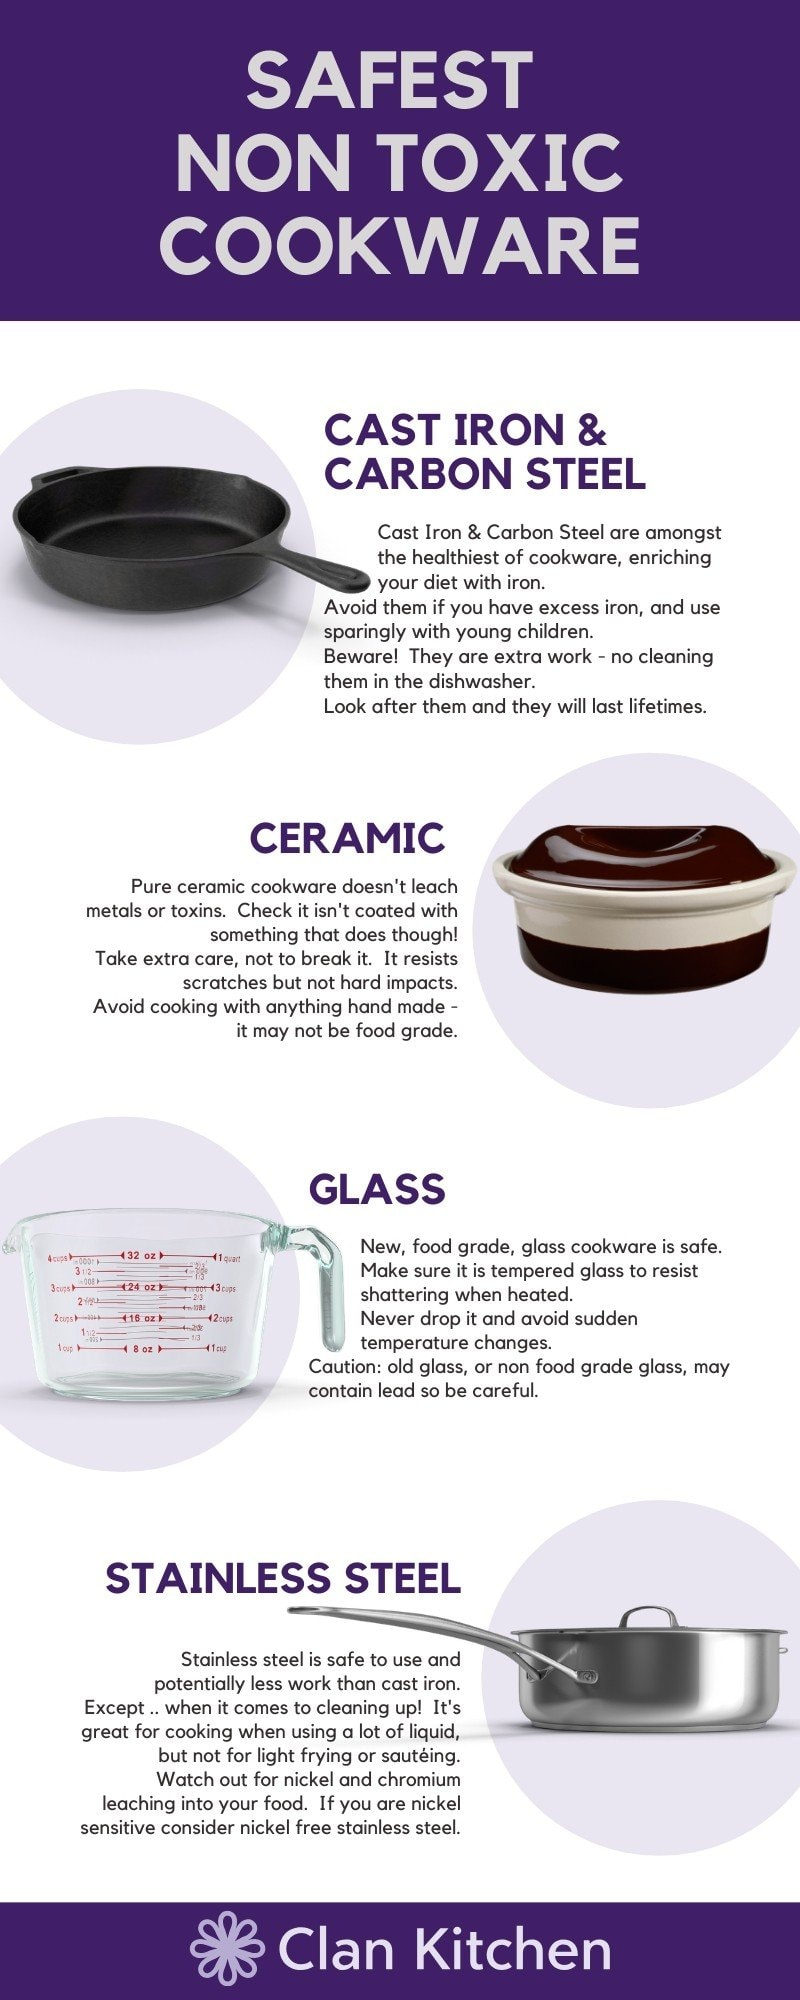 Clan-Kitchen-Safest-Cookware-Infographic